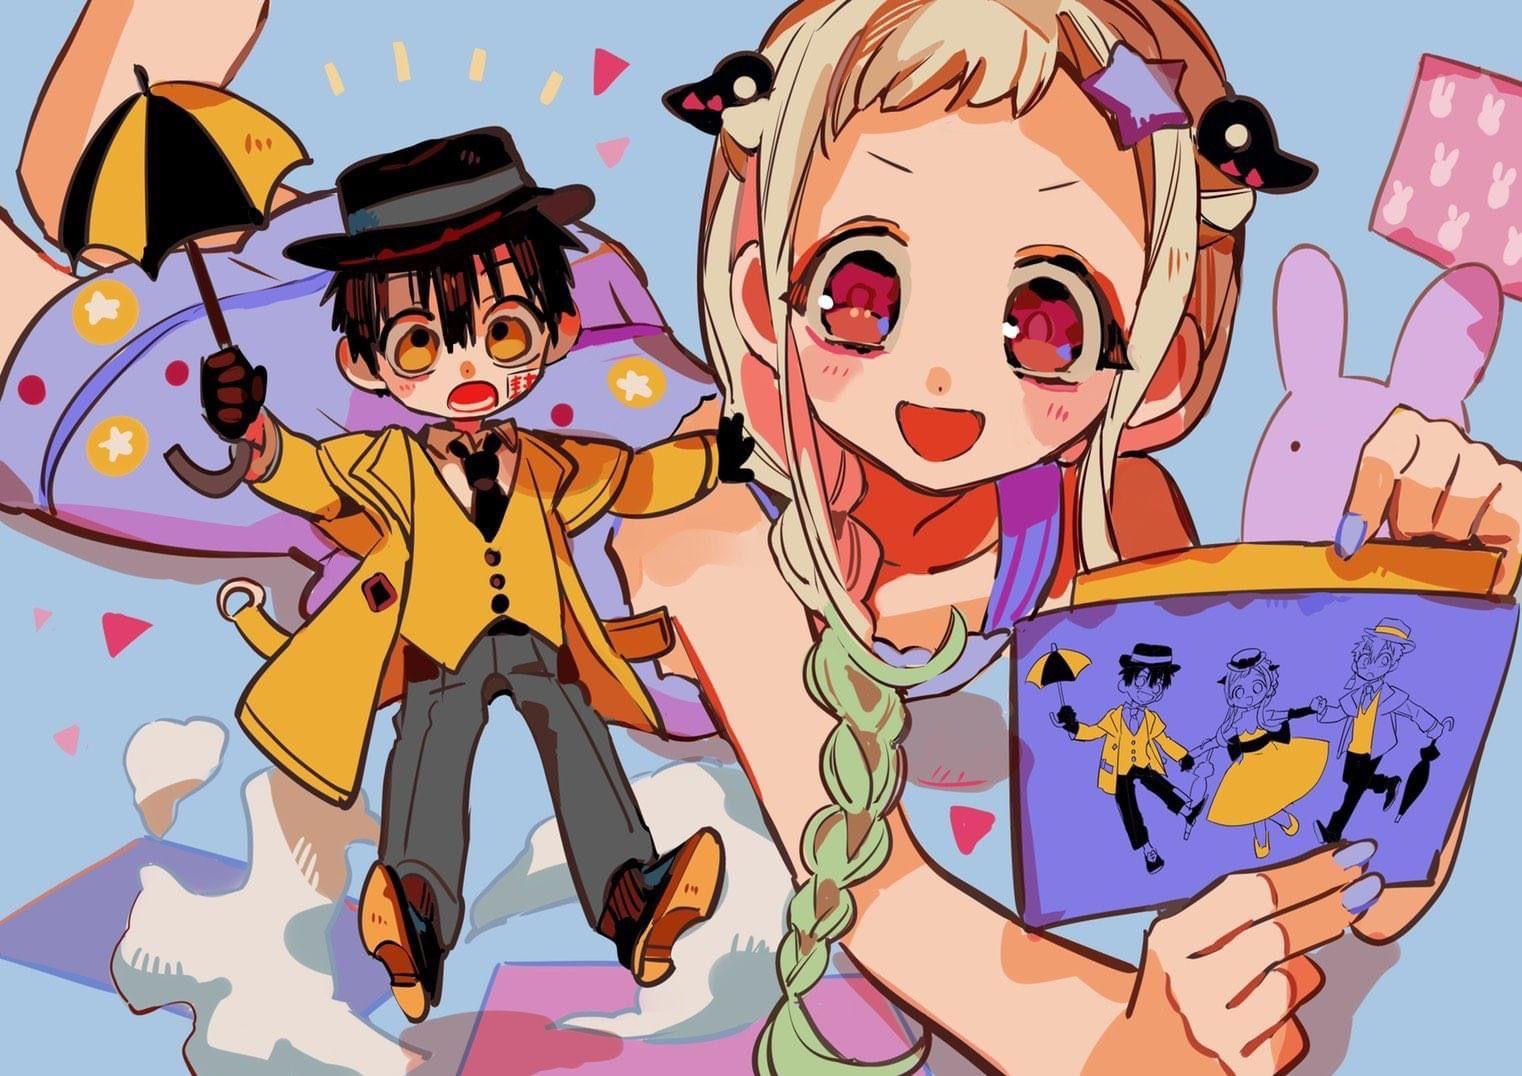 Pin by 文靜 廖 on 動漫圖 in 2020 Hanako, Korean anime, Anime